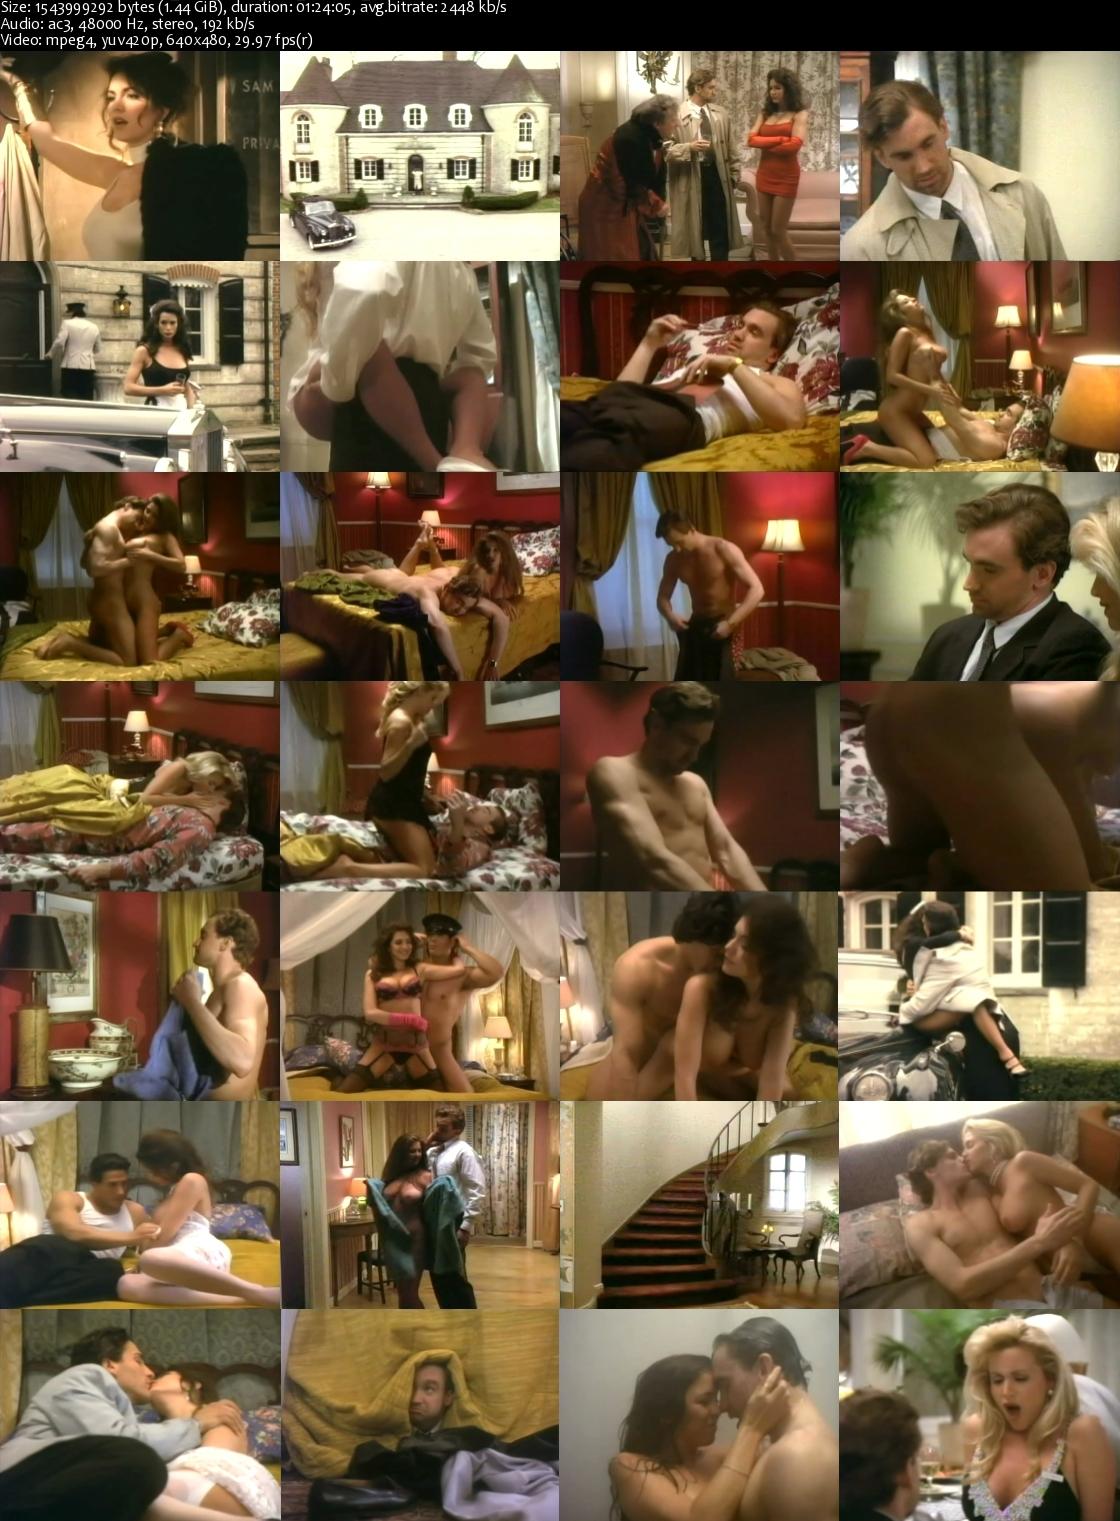 Hot lesbian seducting the maid